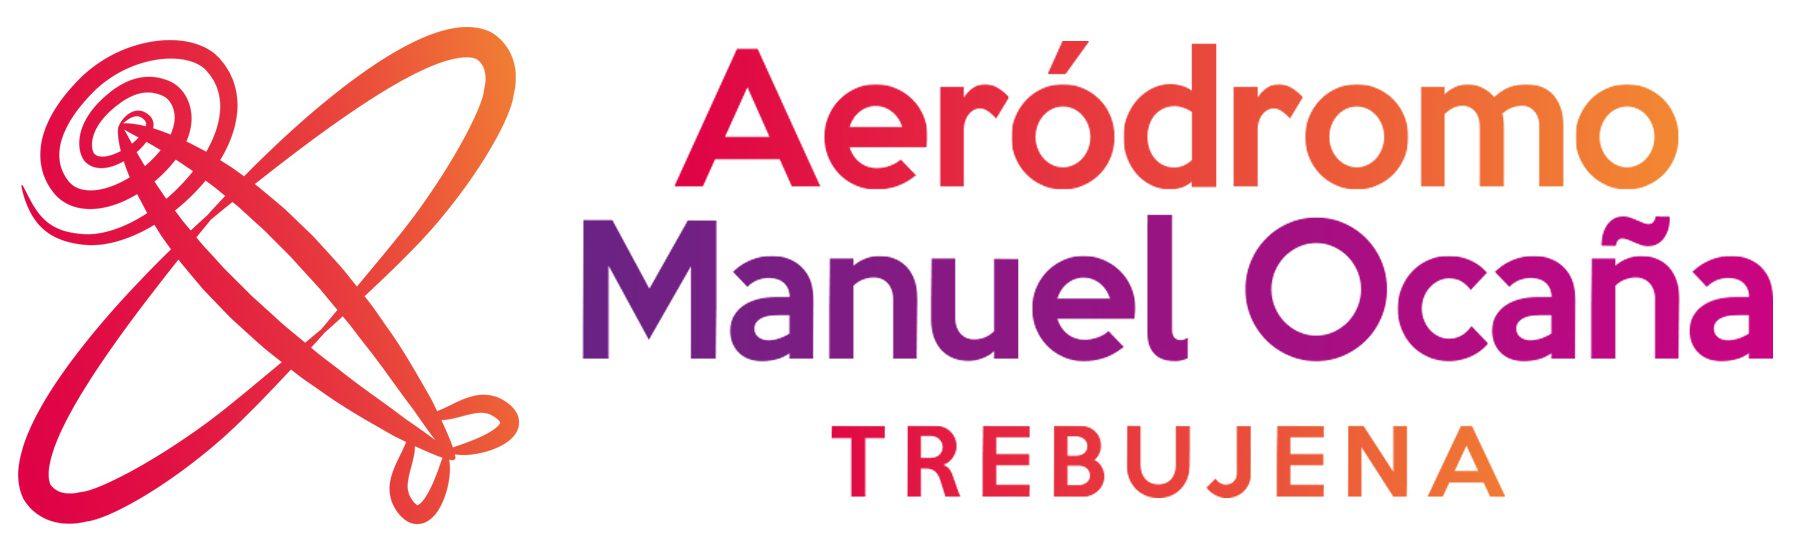 Aeródromo de Trebujena Manuel Ocaña Cádiz